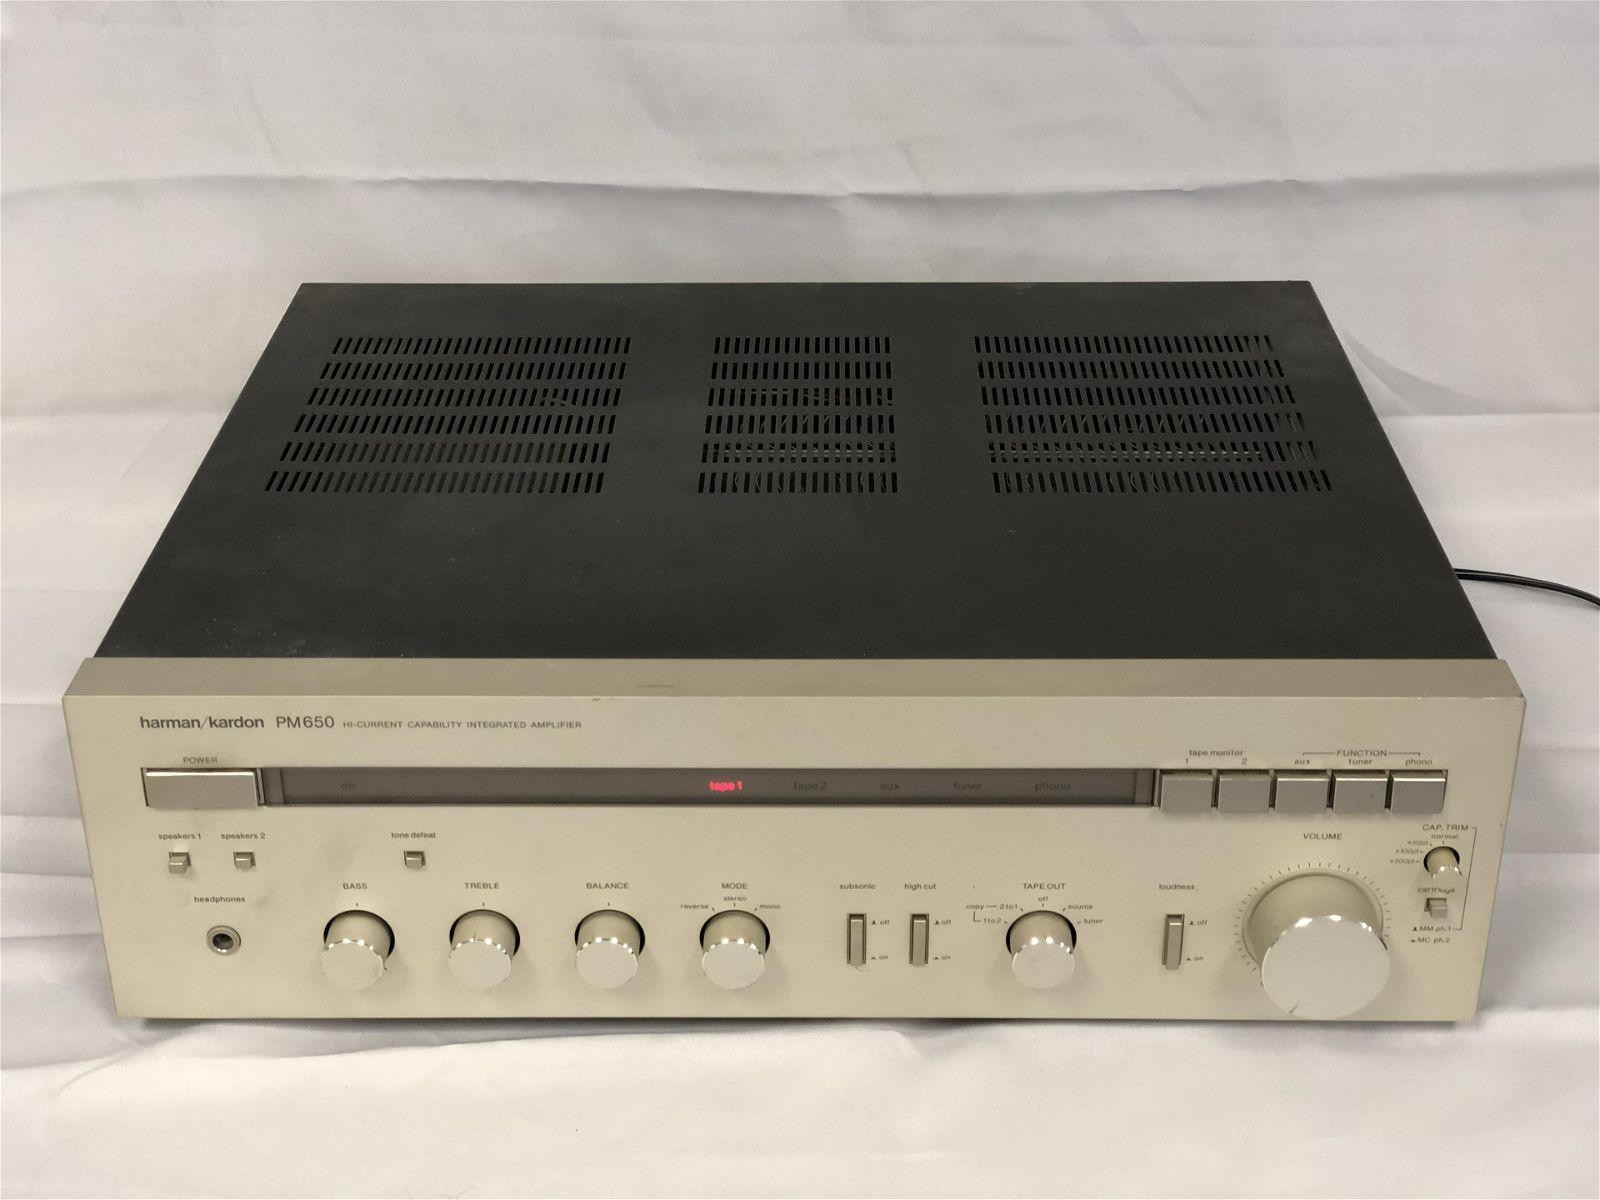 Harman Kardon Amplifier PM650 - Powers Up, UNTESTED